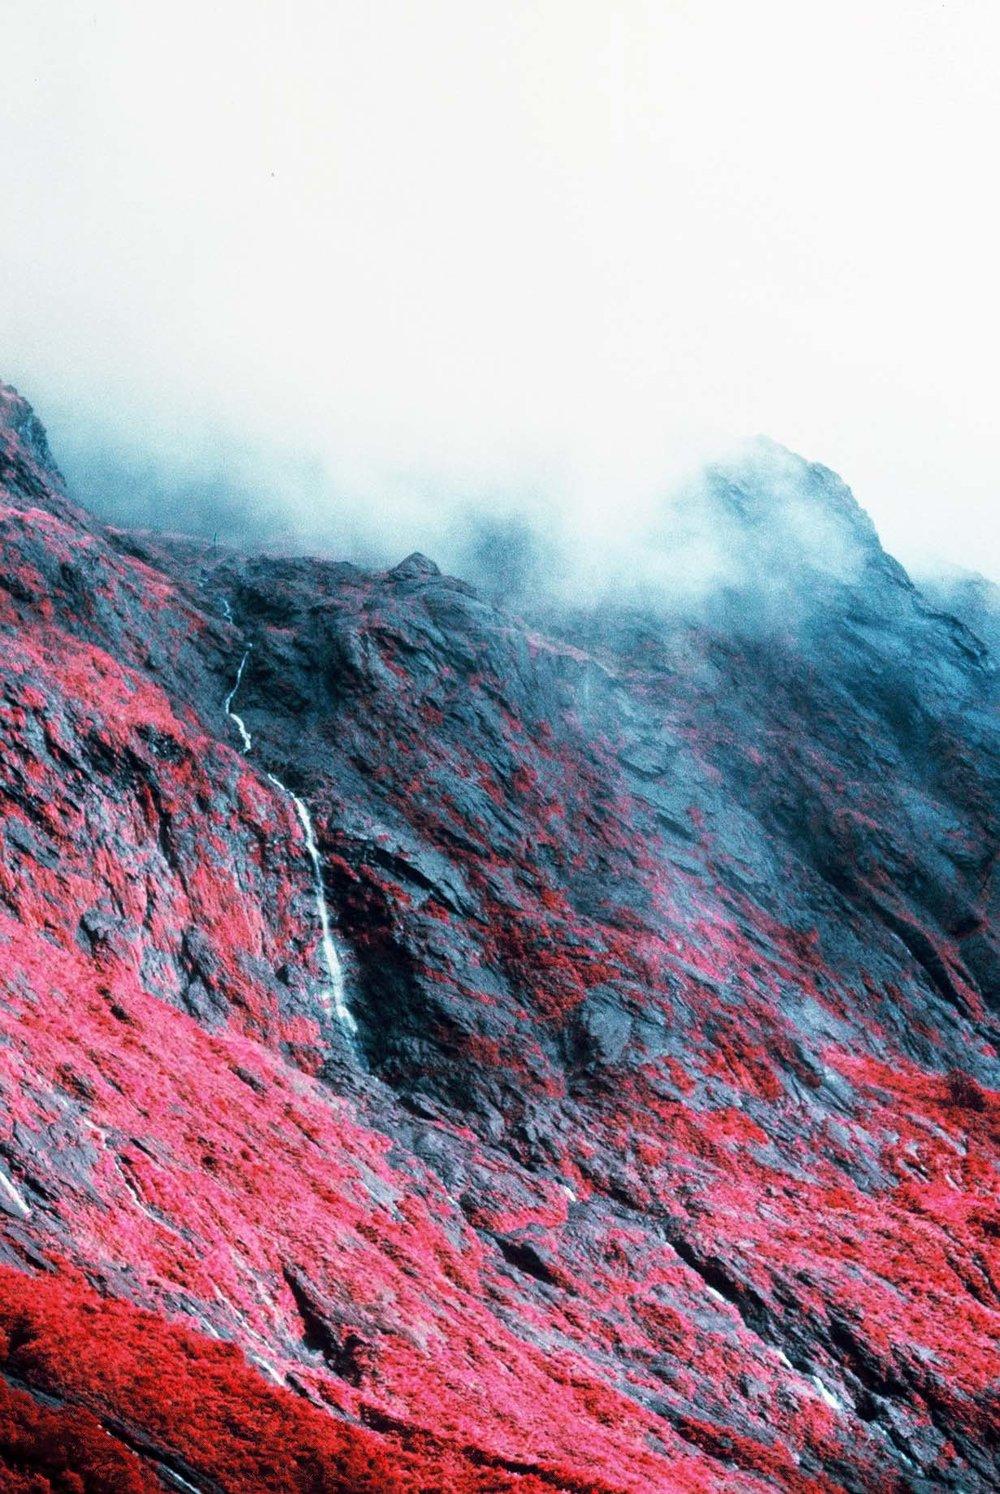 Infrared-New-Zealand-Kasia-Sykus-11.jpg